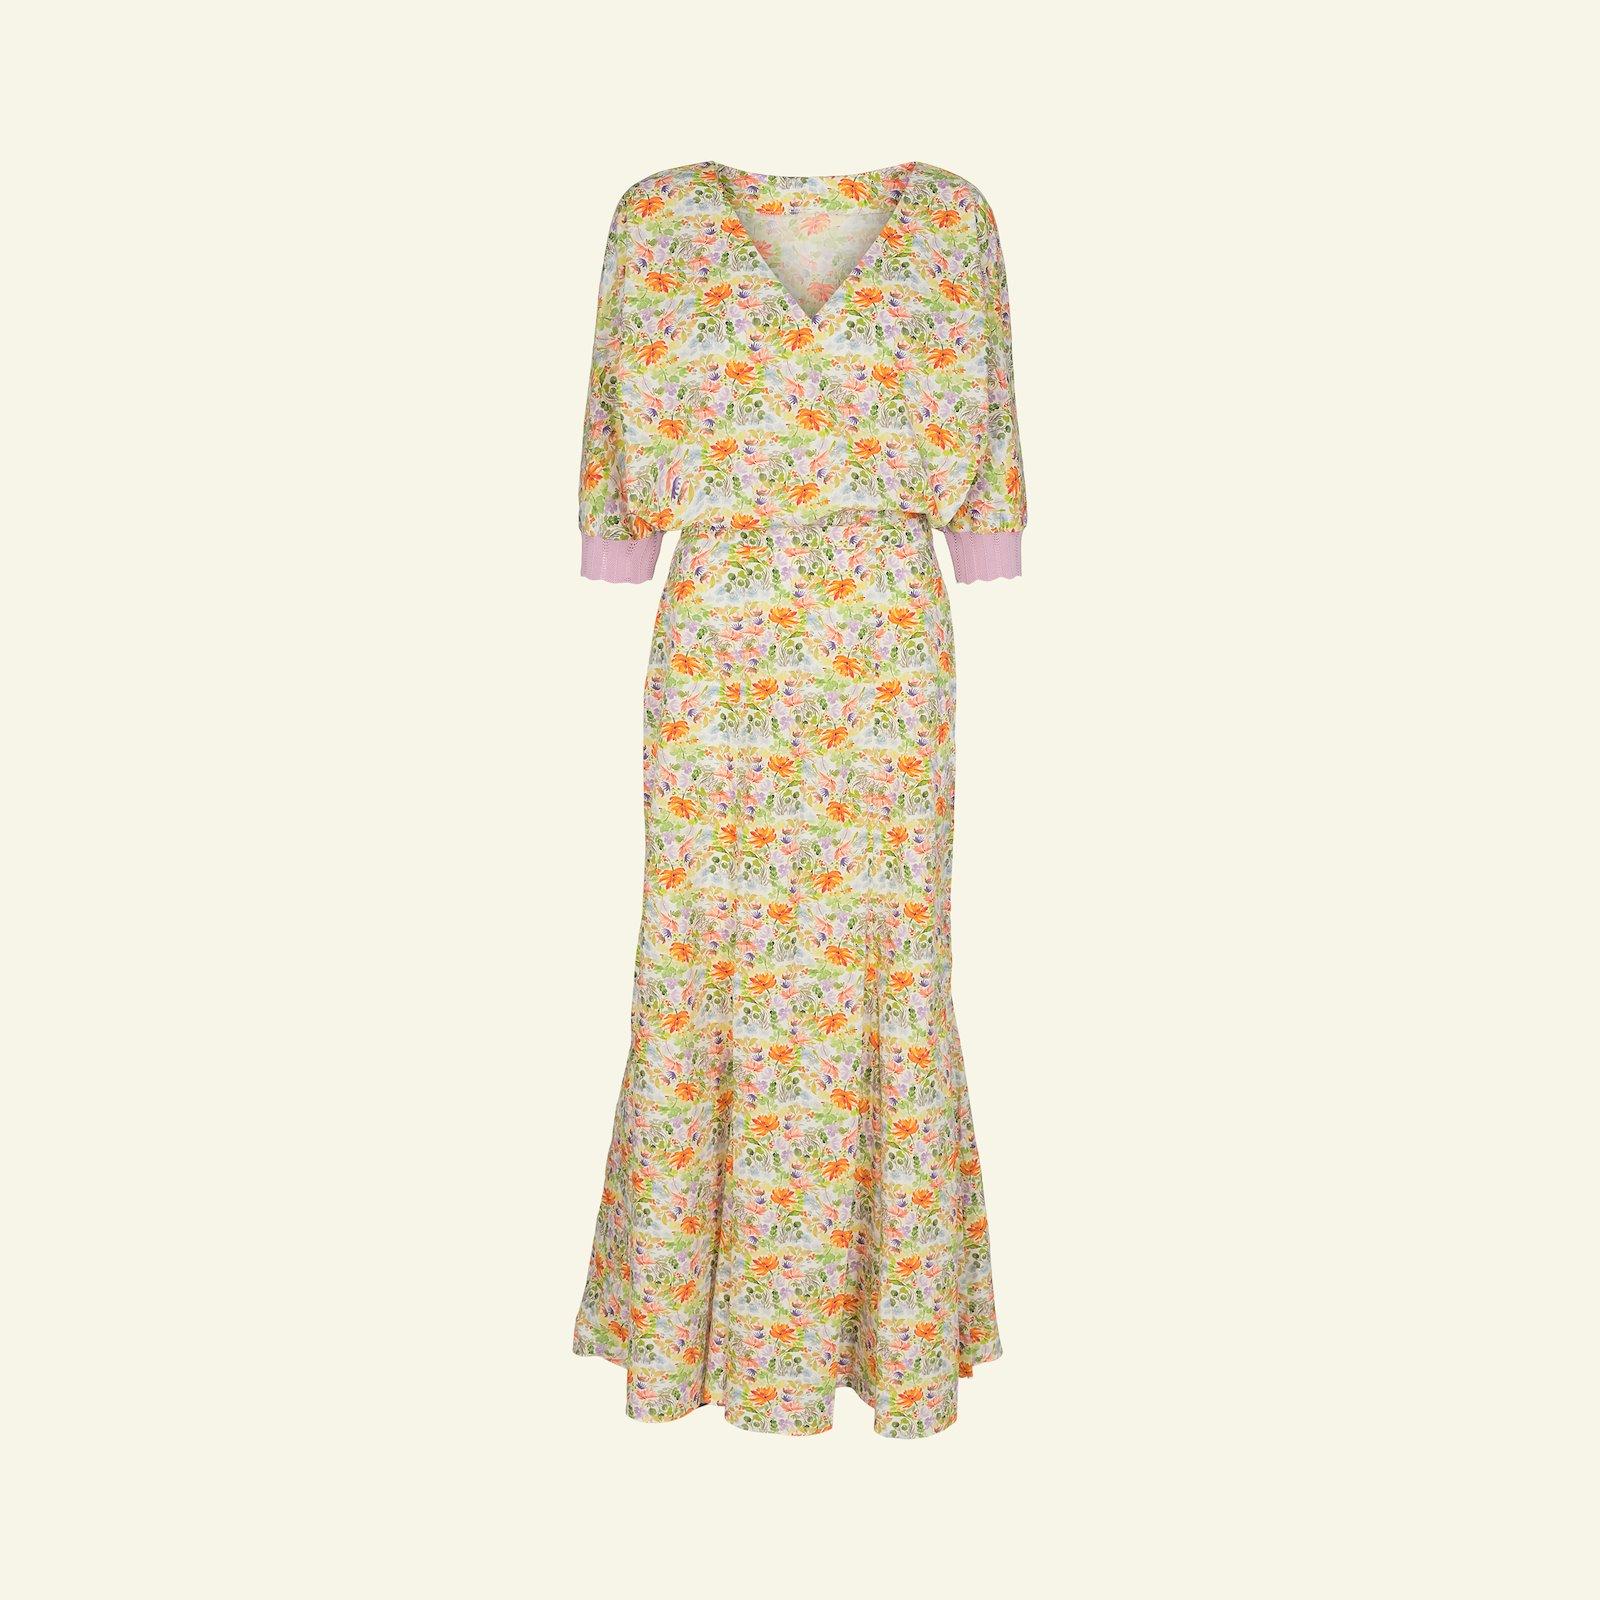 Wide dress with V-neck, 44/16 p23153_540109_96138_sskit